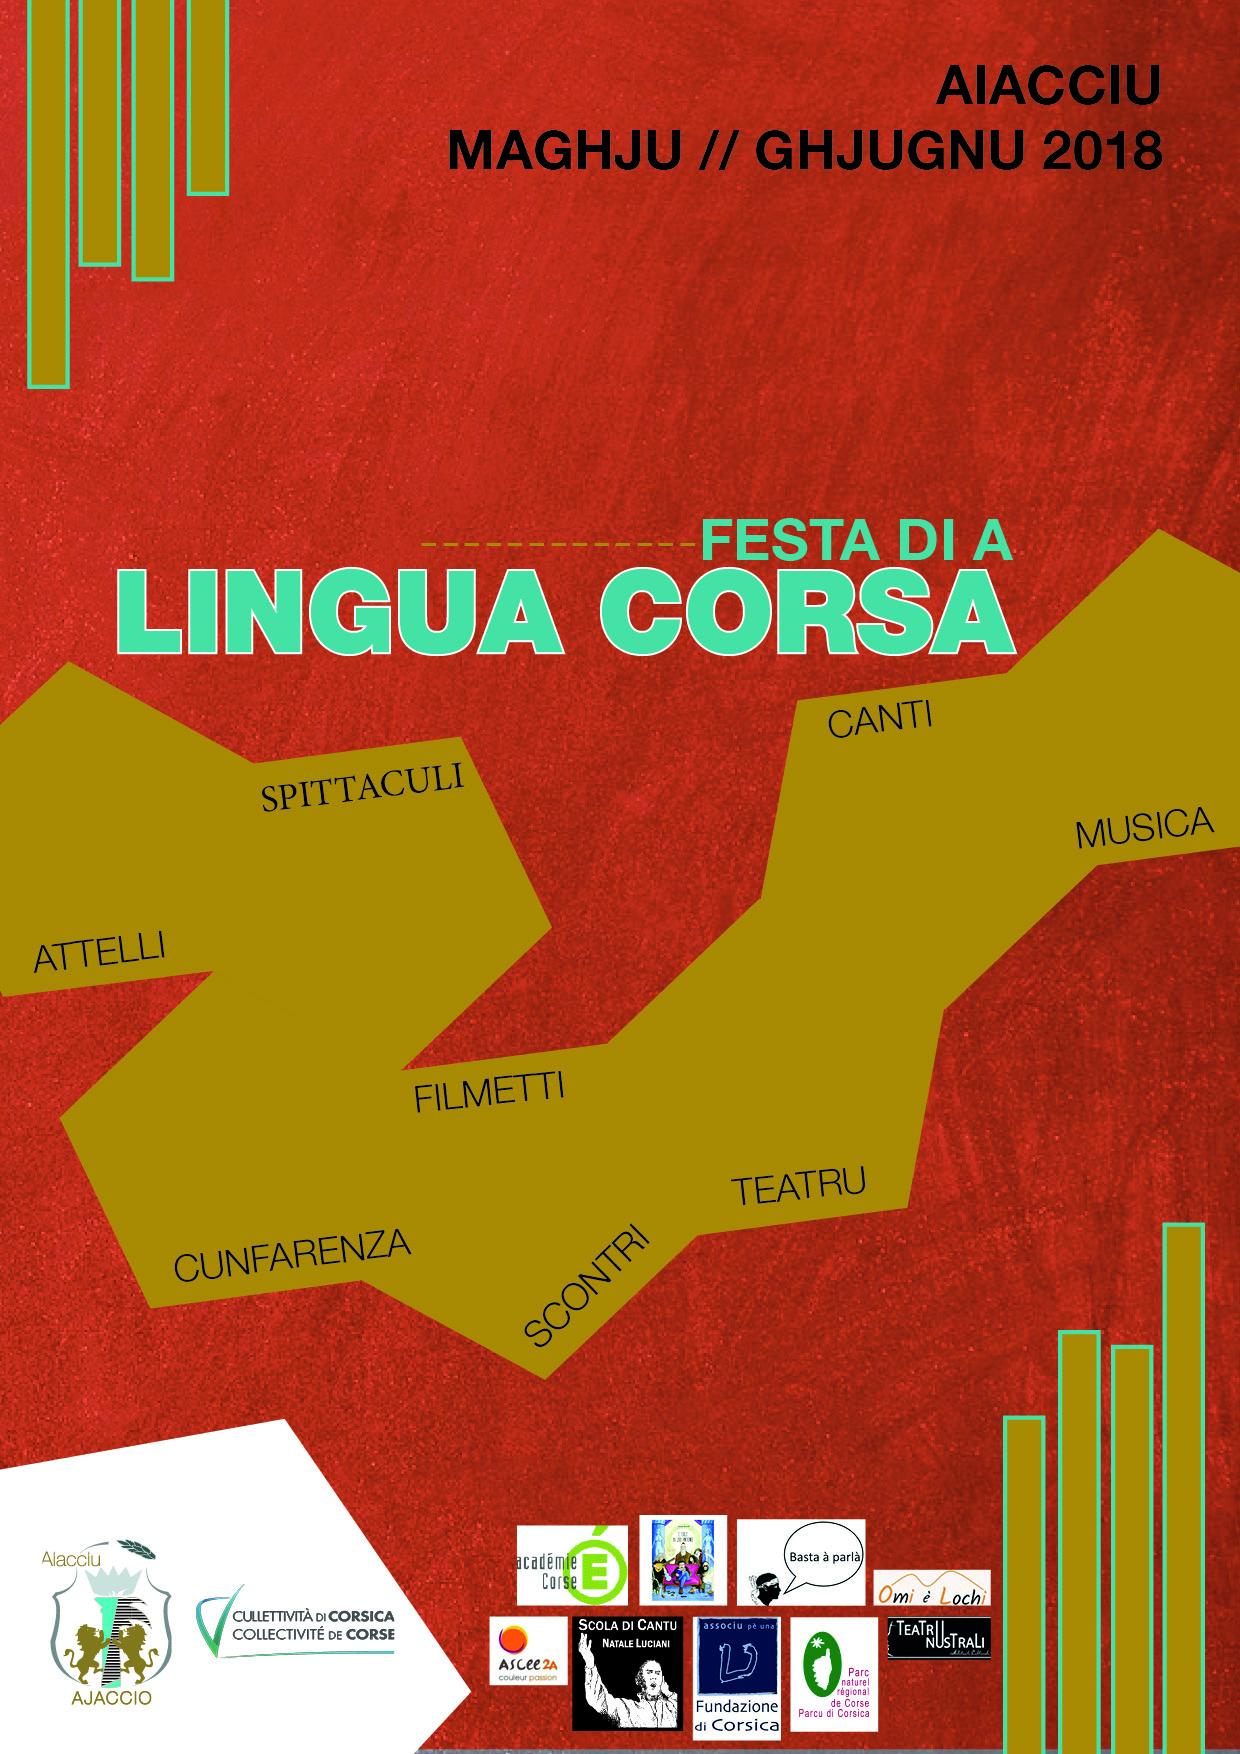 En mai et juin c'est la Festa di a Lingua Corsa 2018